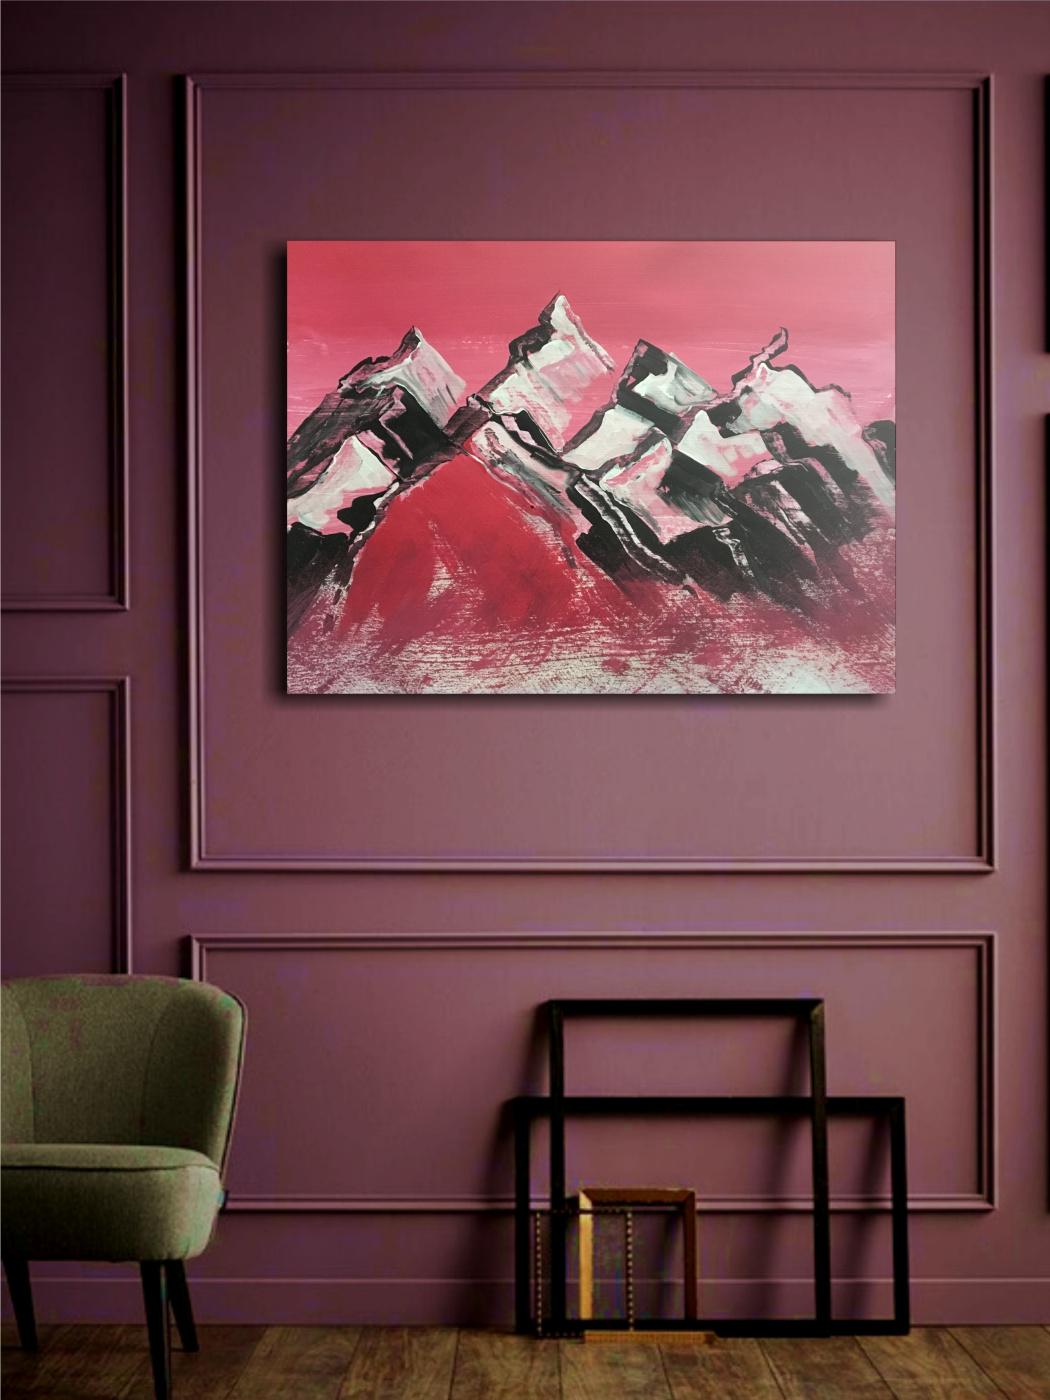 Julia Rashidovna Akhmetova-Walter. Mountain